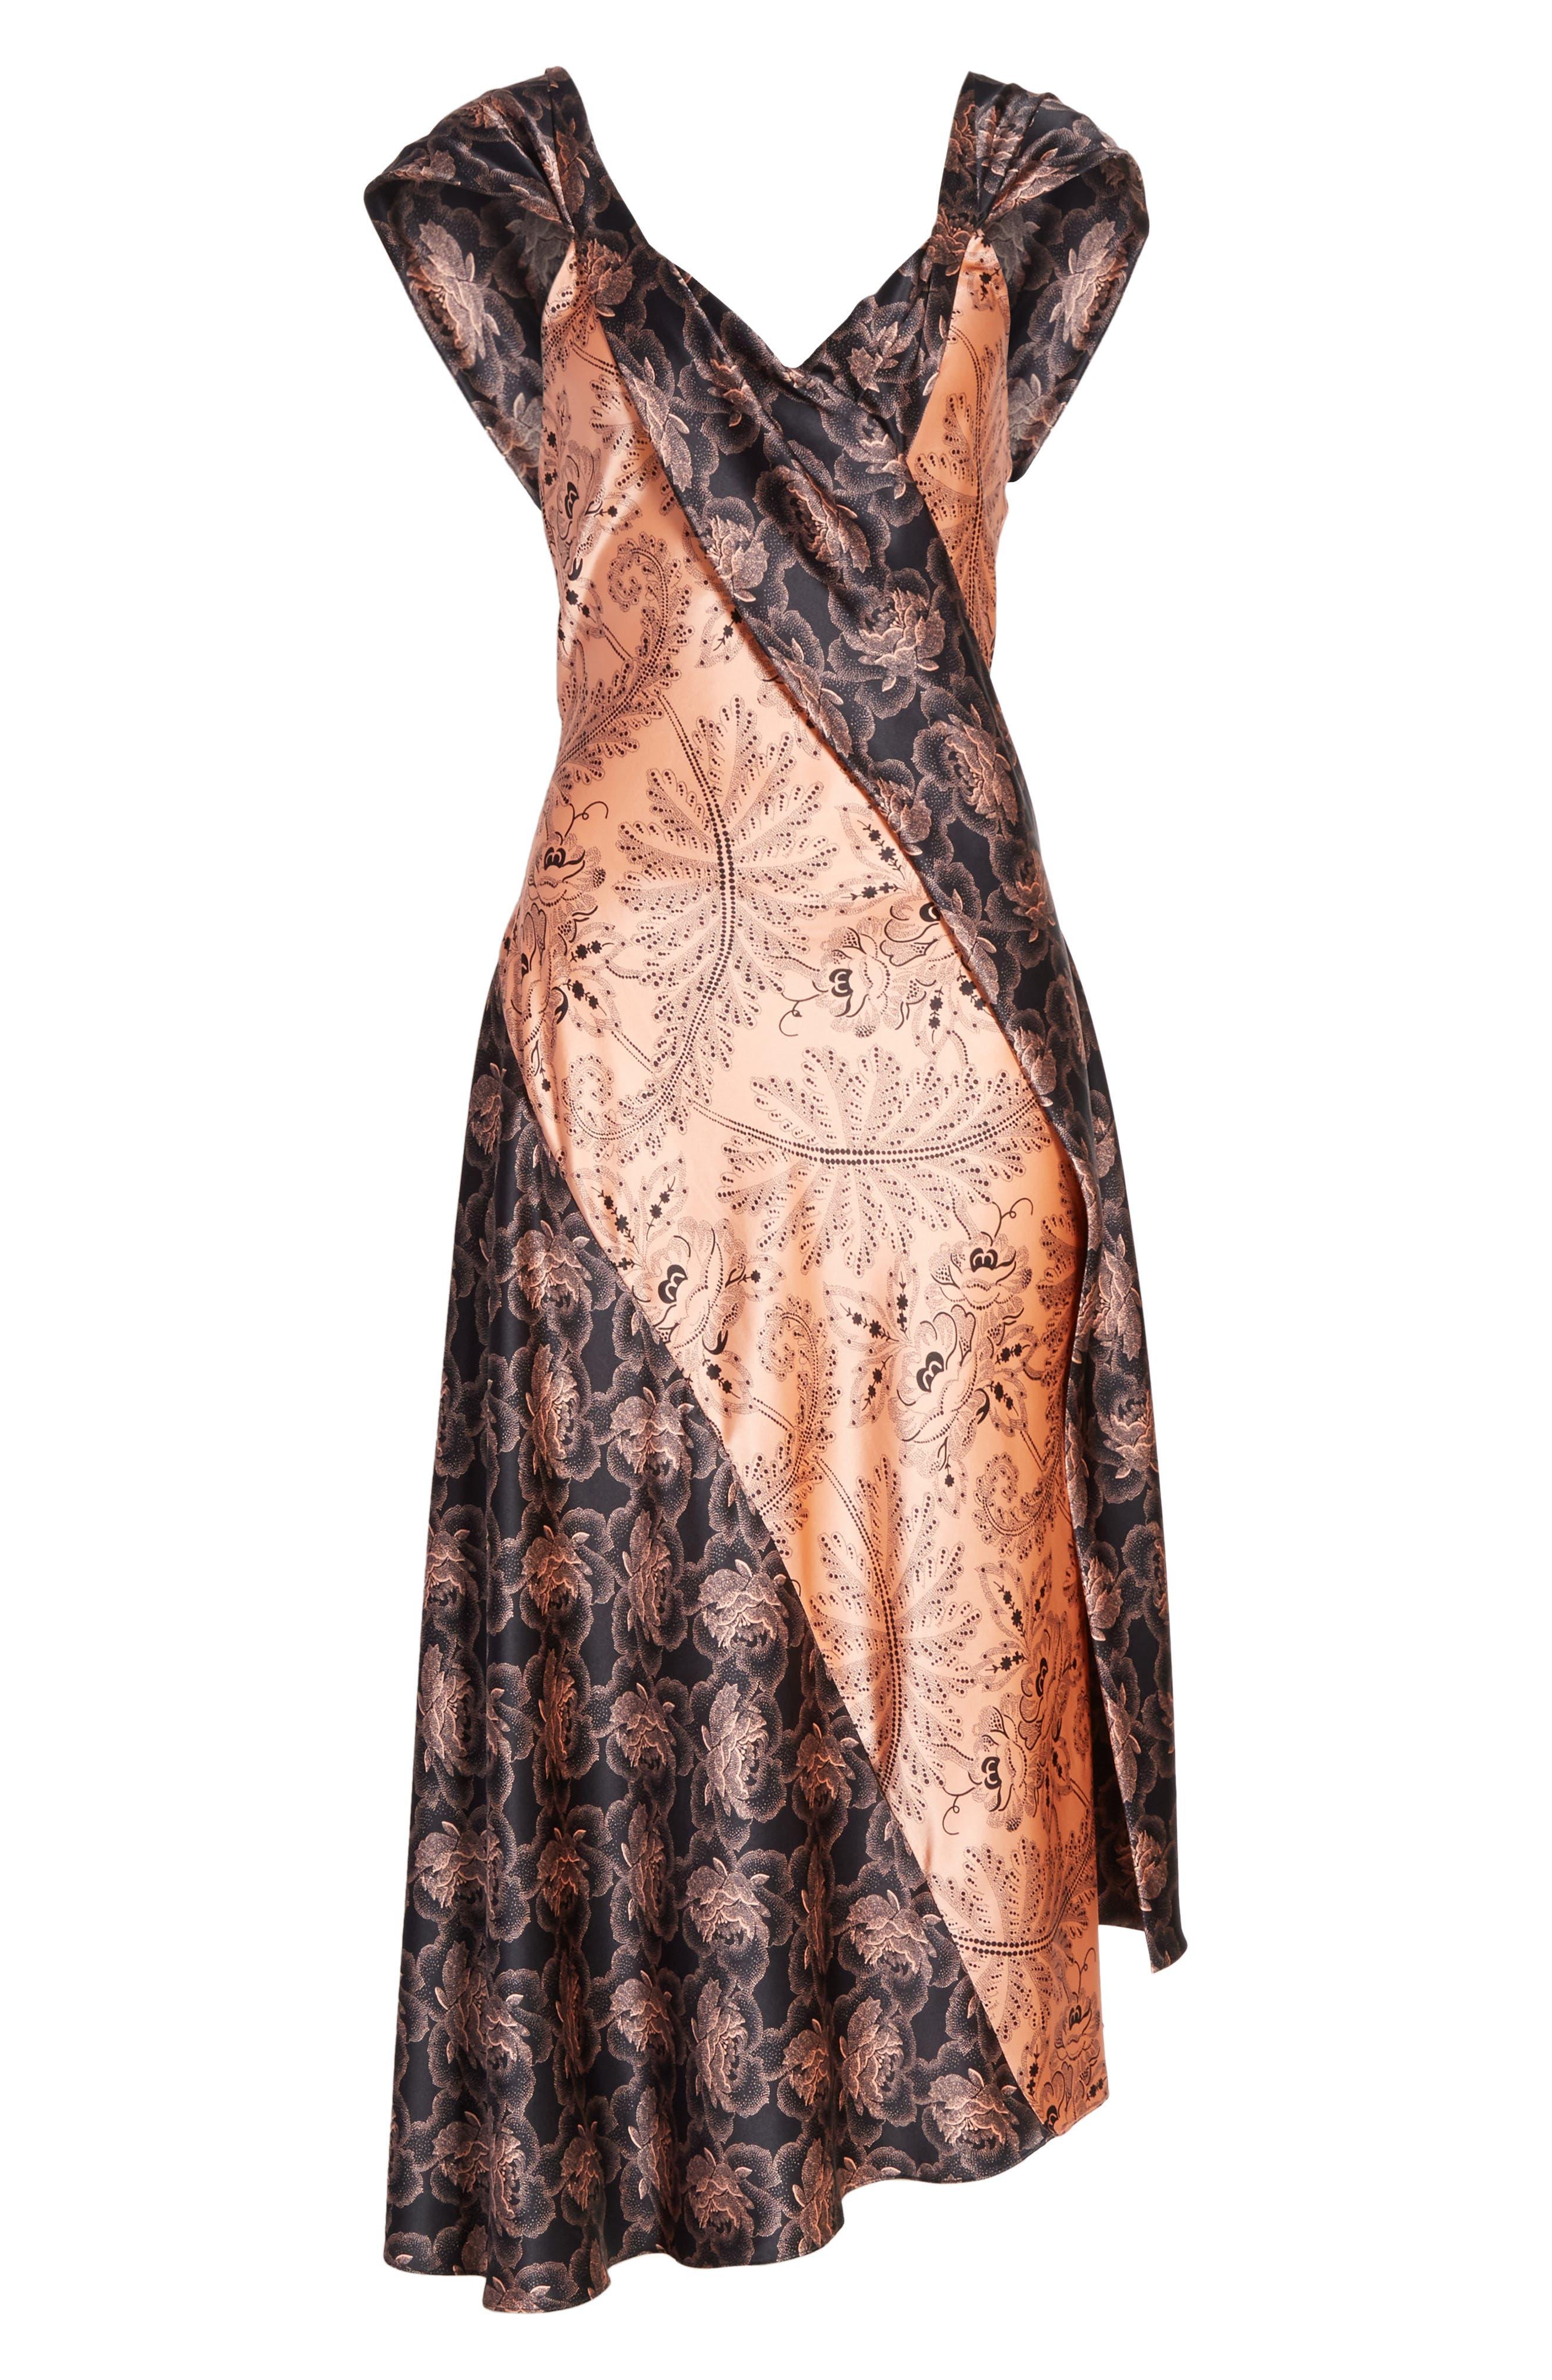 Diane von Furstenberg Draped Mixed Floral Midi Dress,                             Alternate thumbnail 6, color,                             654